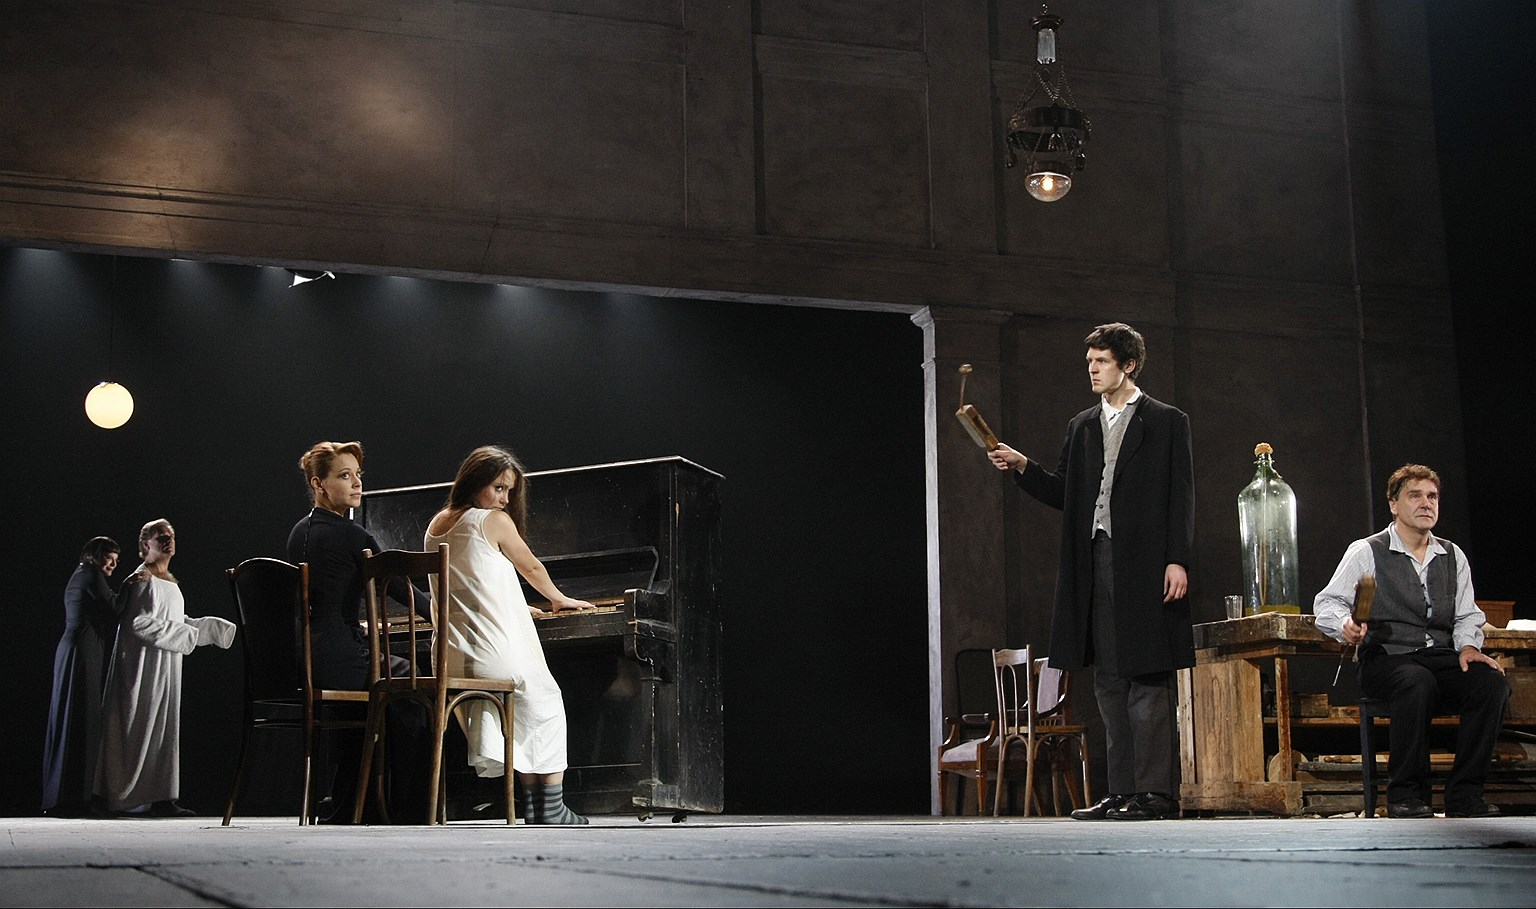 Спектакль «Дядя Ваня» на сцене Театра им. Евг. Вахтангова. Постановка Р. Туминаса